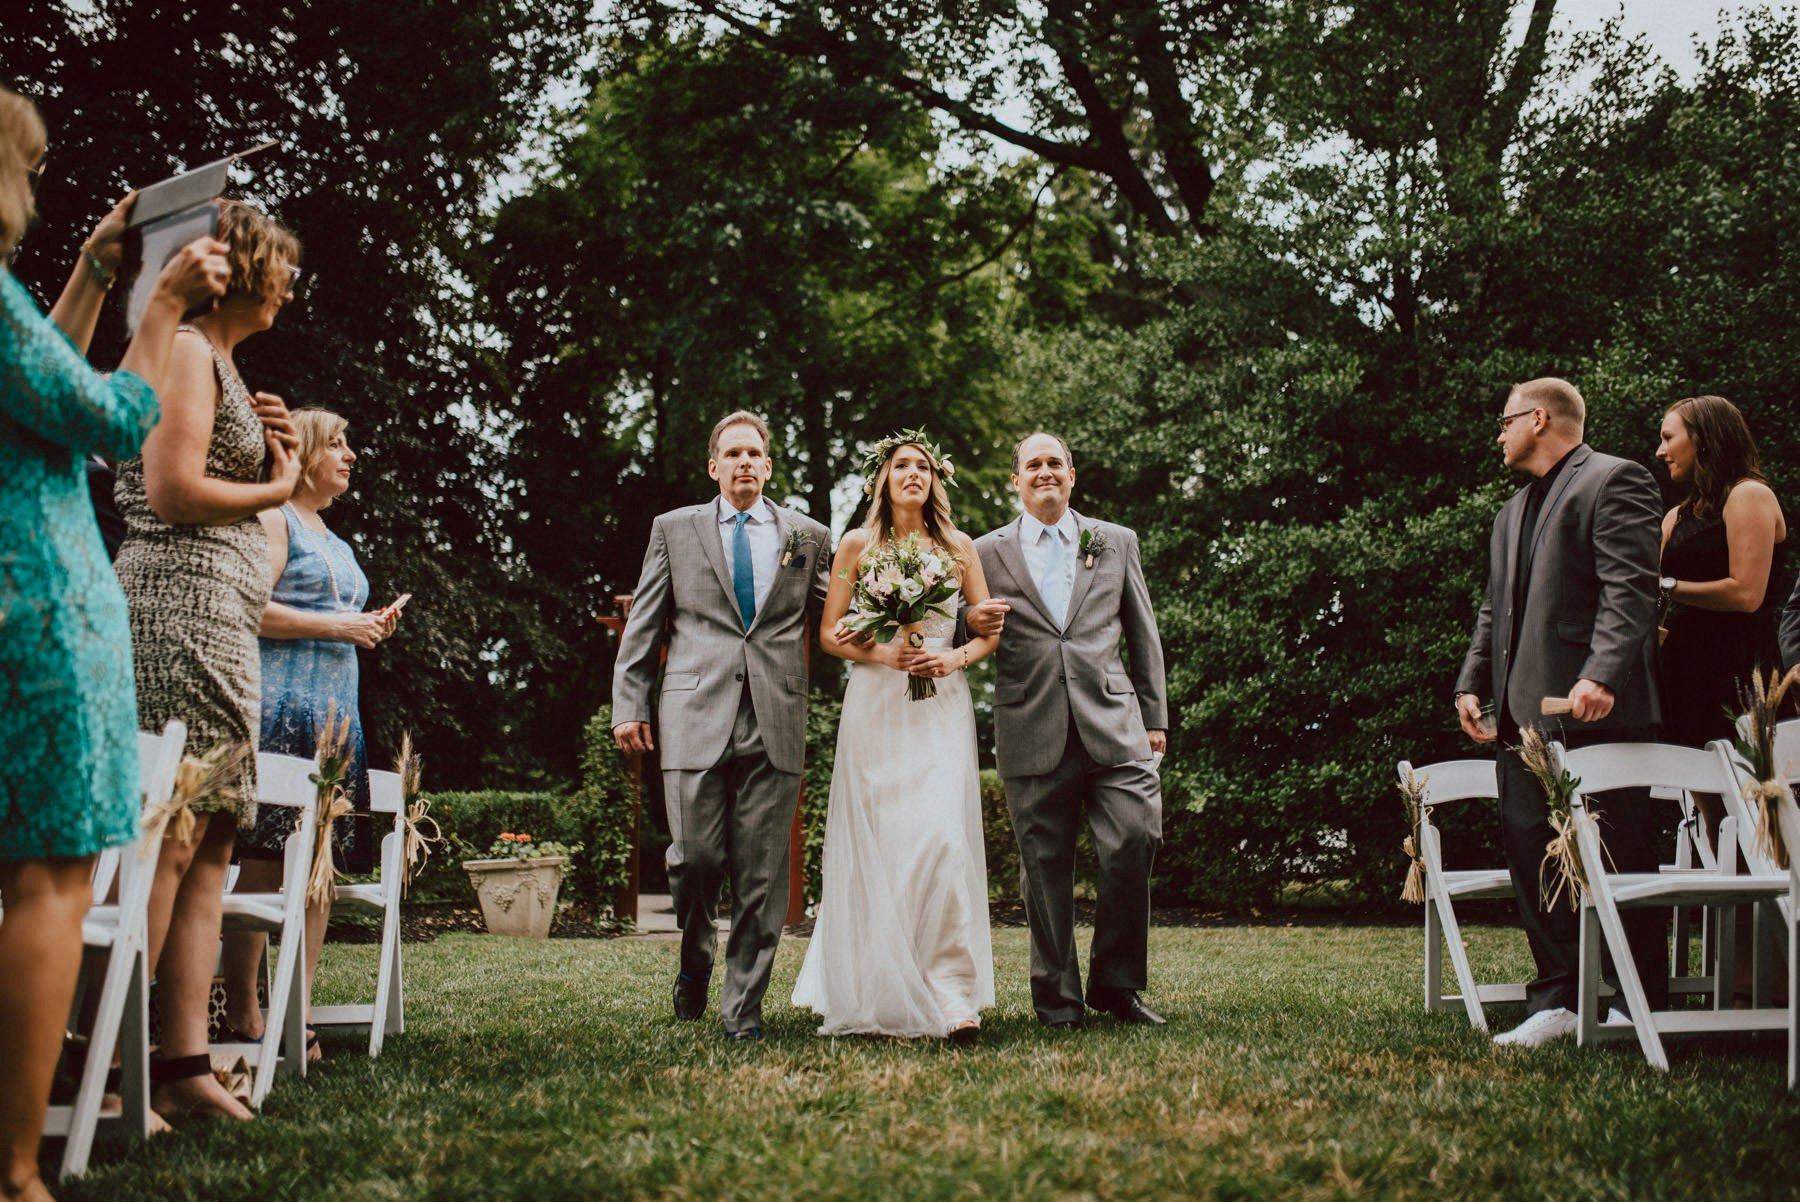 Knowlton-mansion-wedding-91.jpg